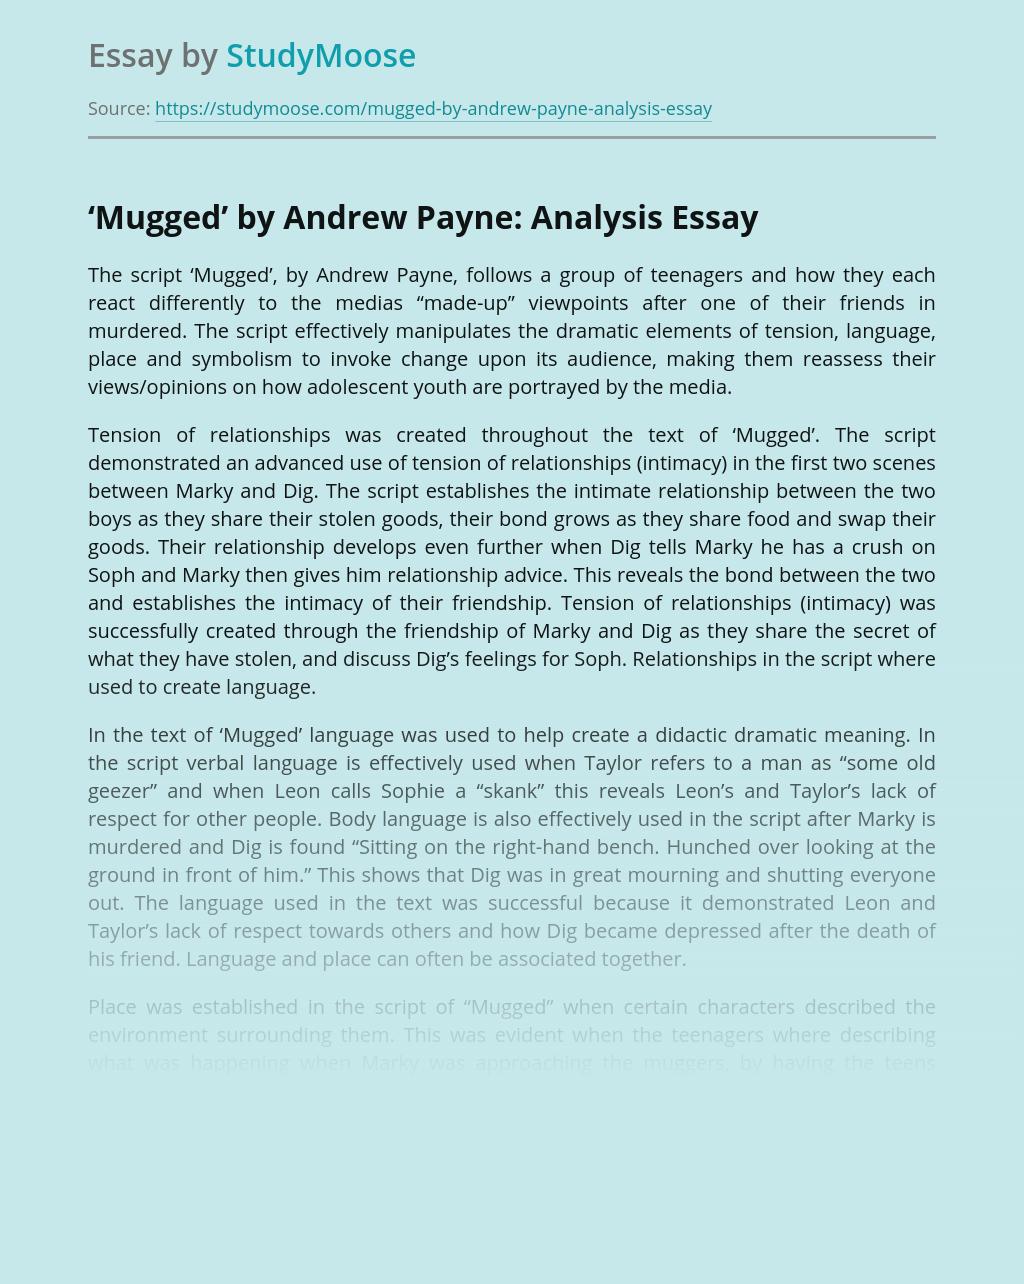 'Mugged' by Andrew Payne: Analysis